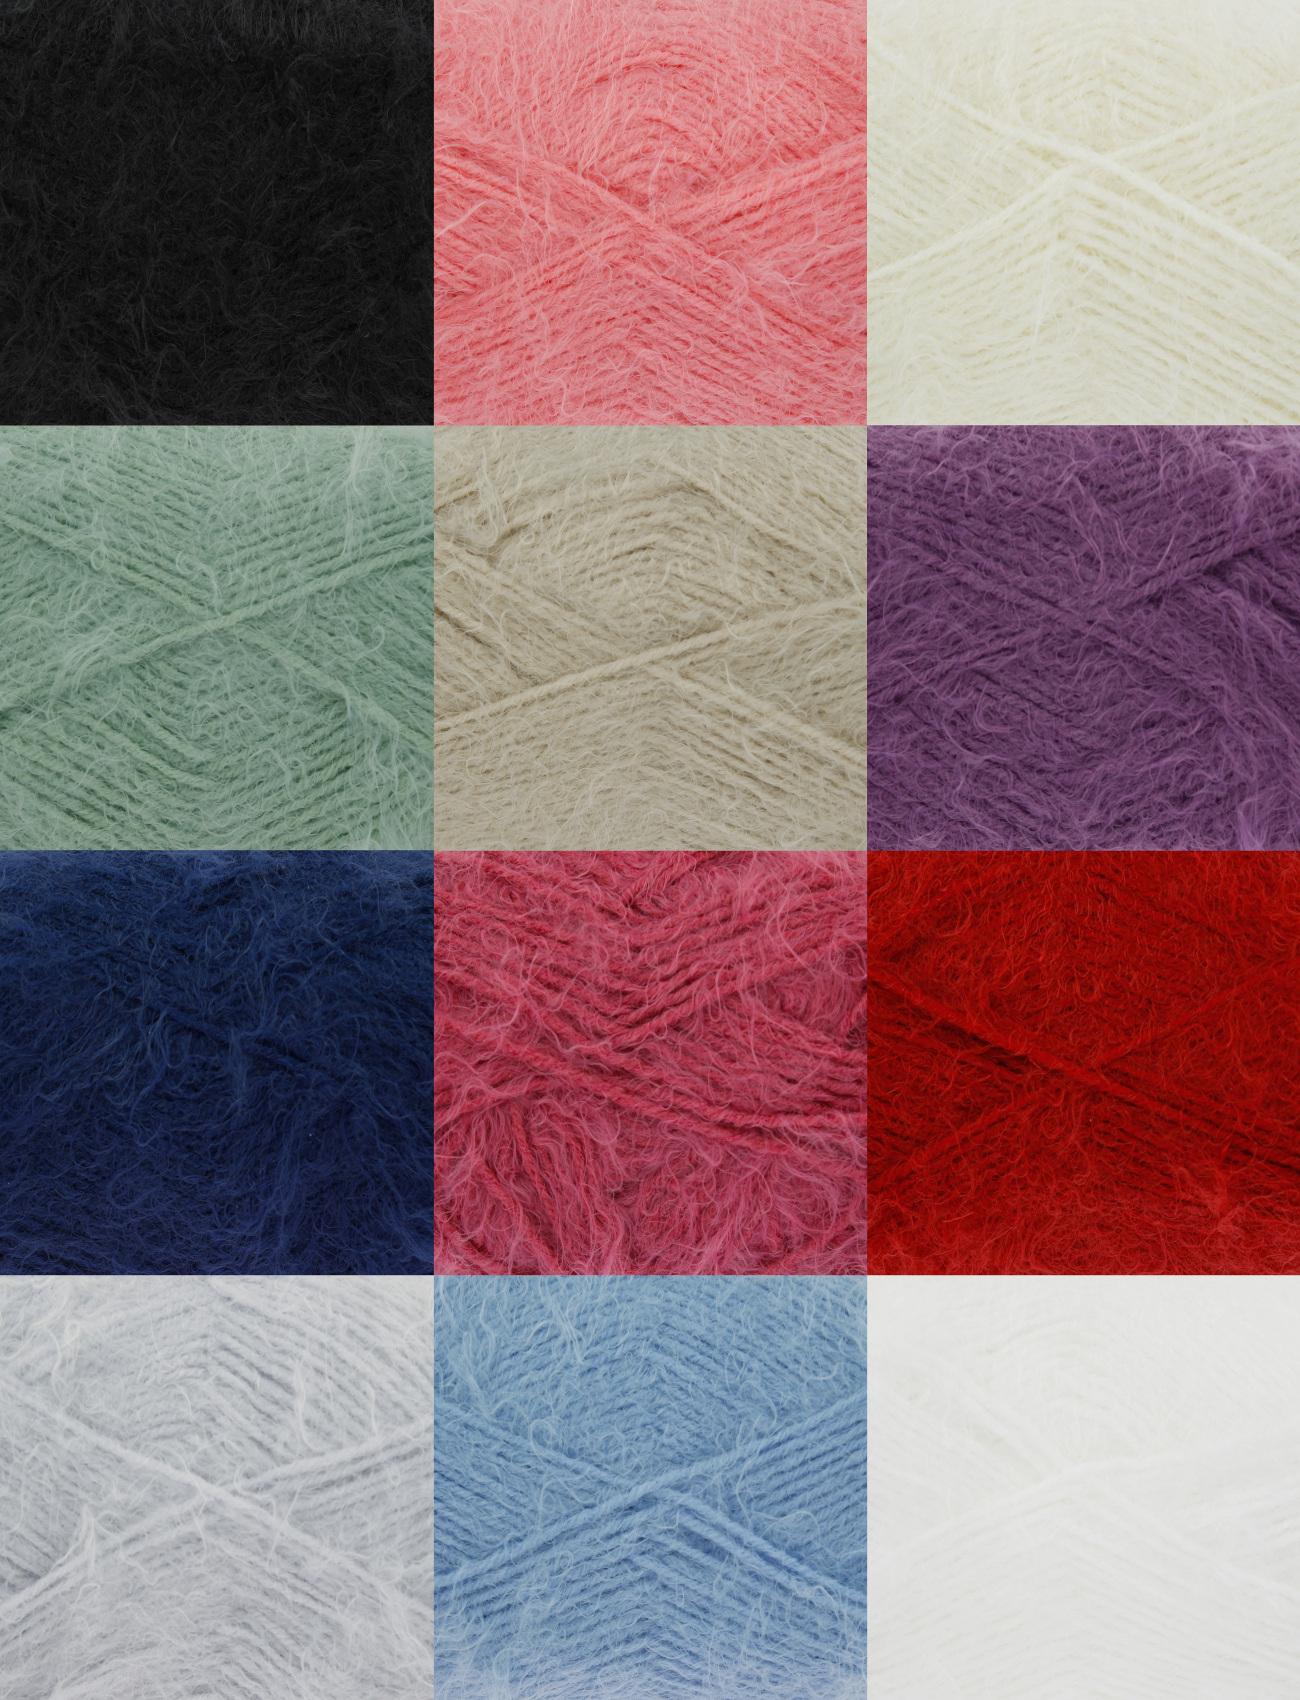 Free Knitting Pattern Dk Yarn : King Cole Embrace DK & Free Knitting Pattern Double Knit Soft Fluffy Yarn...